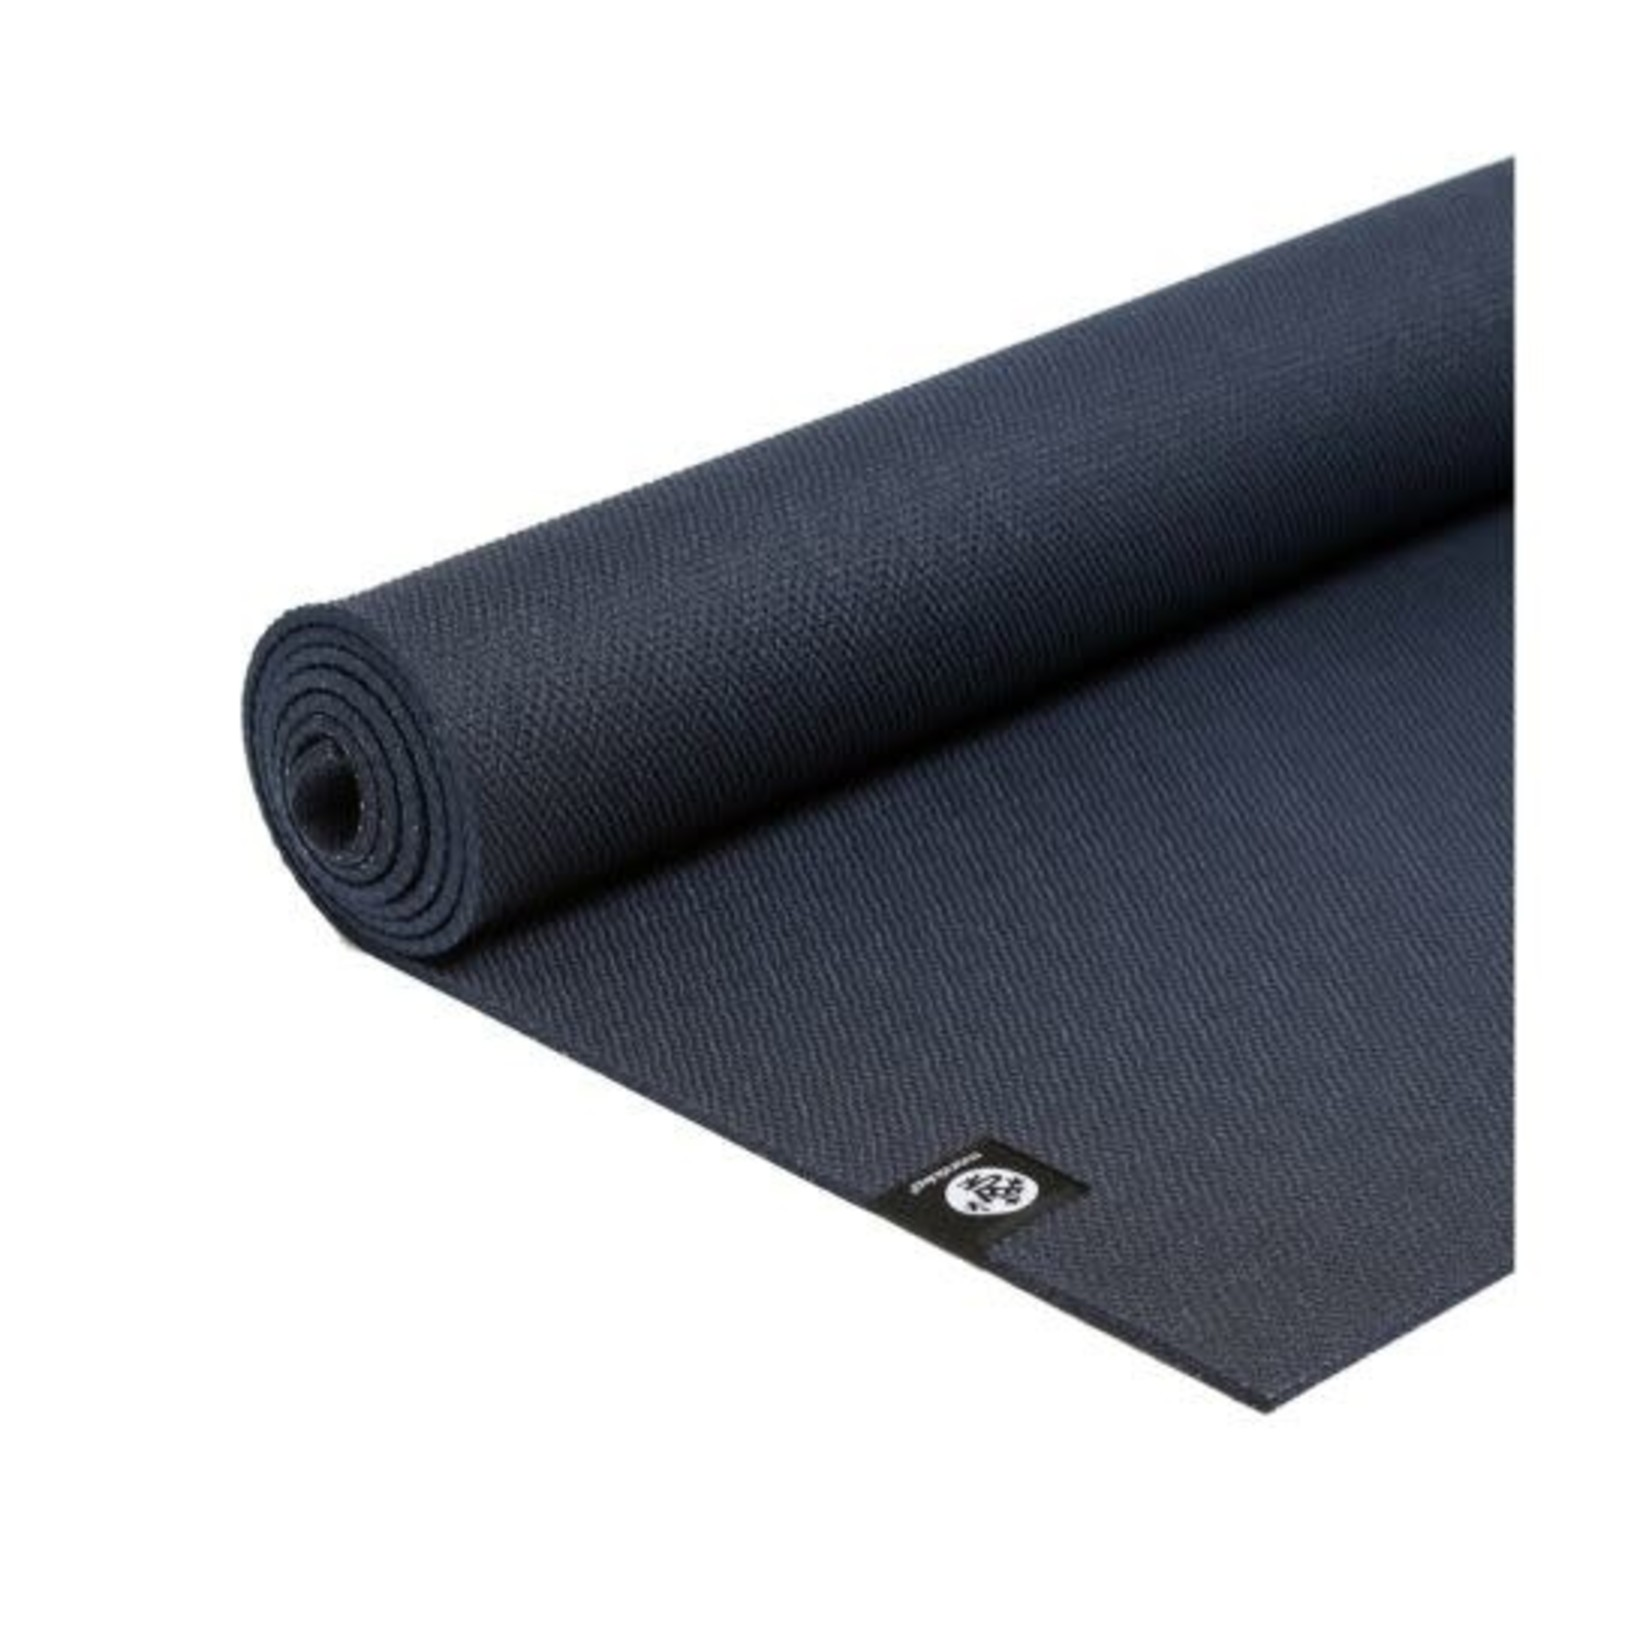 Manduka Manduka X training yoga mat-71 inch-Midnight 5mm